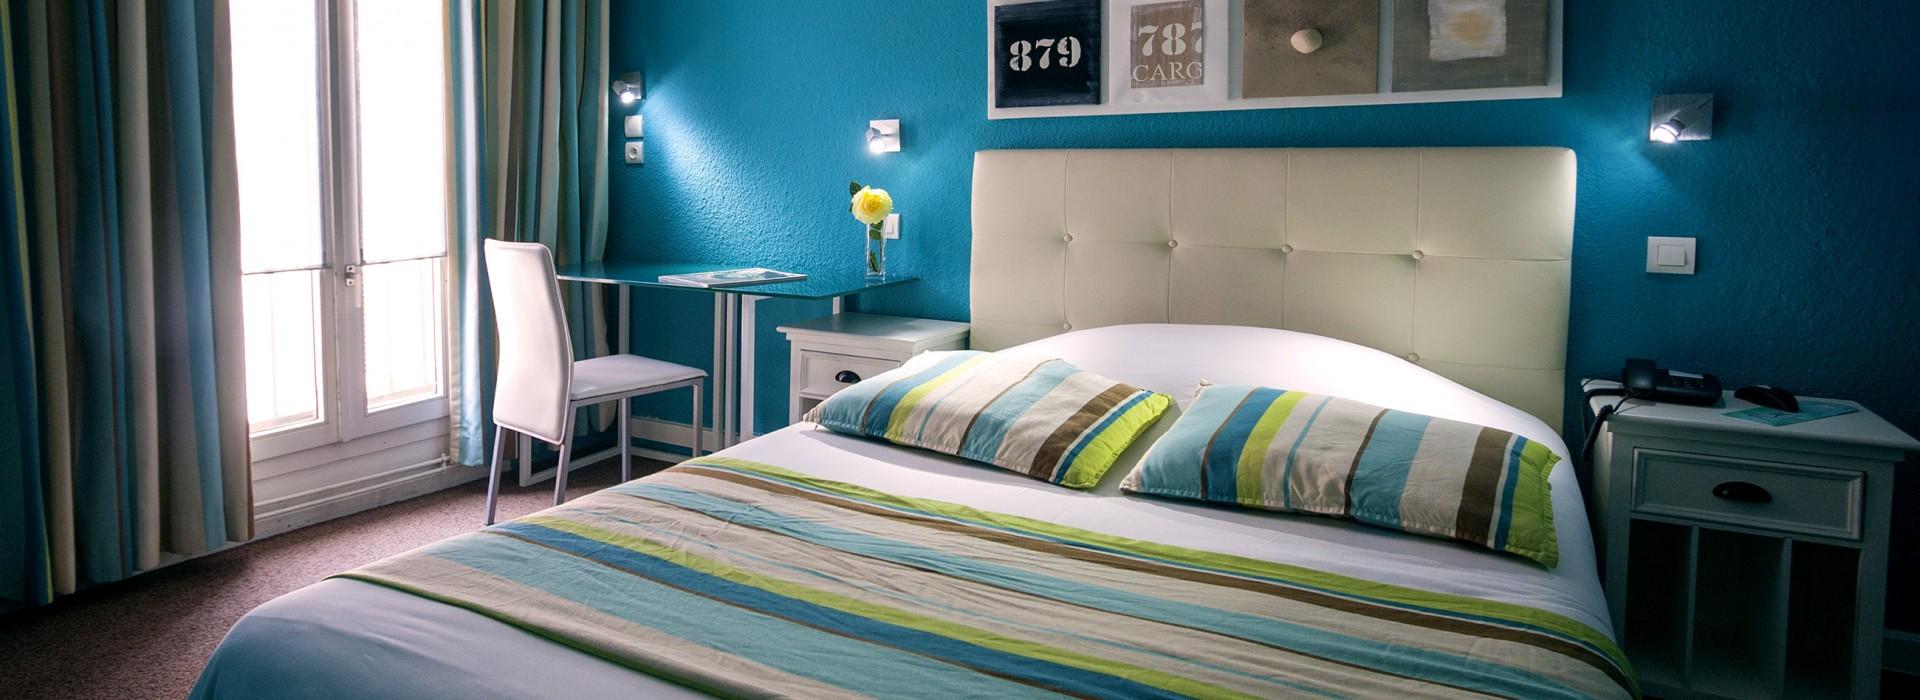 https://etc-hotel.com/public/uploads/2016/02/225_LAGON_IMG_5500_RVB_HD-1920x700.jpg